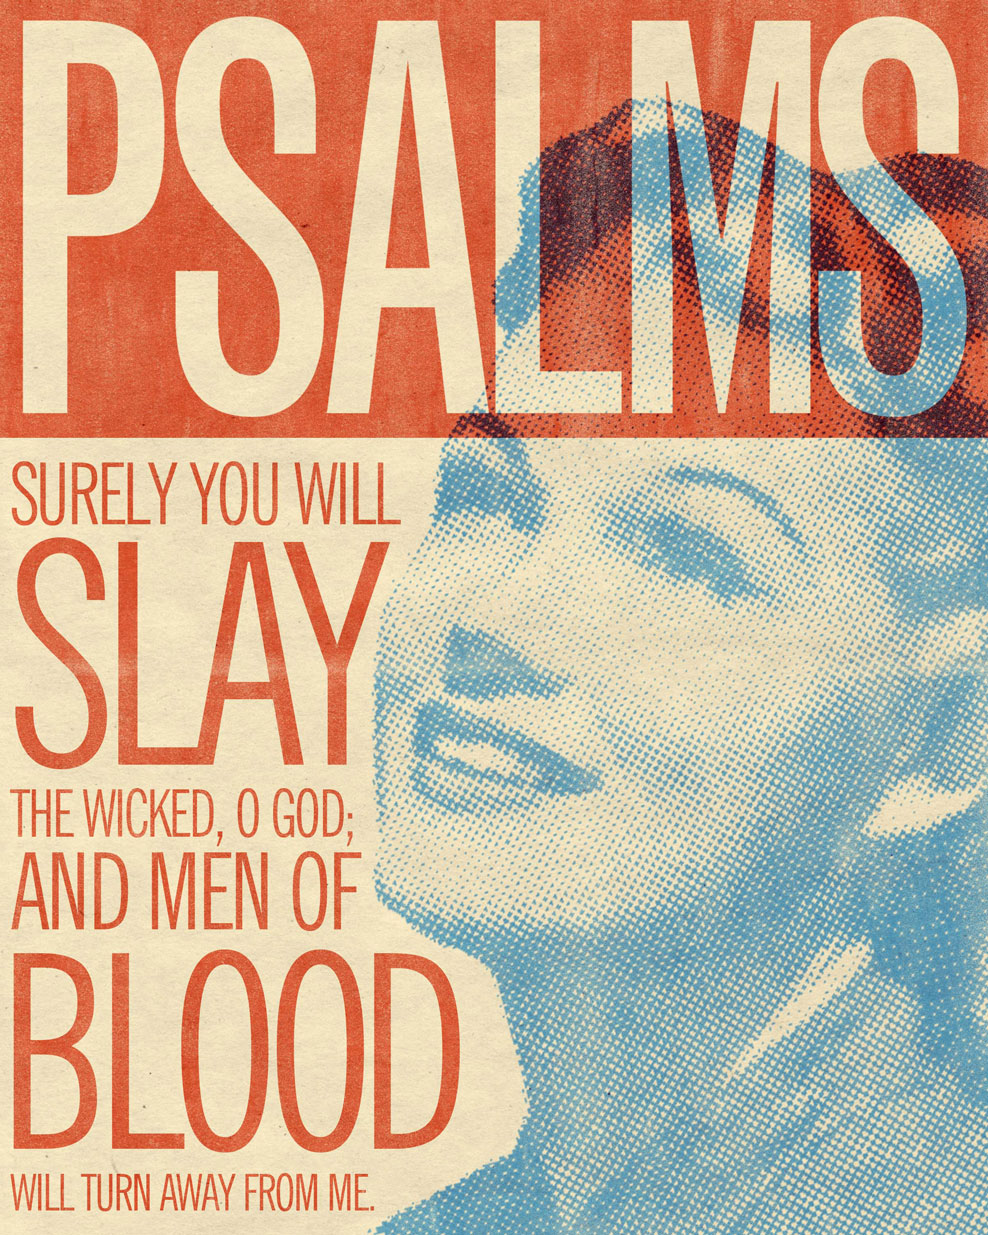 19-Psalms-01_988.jpg